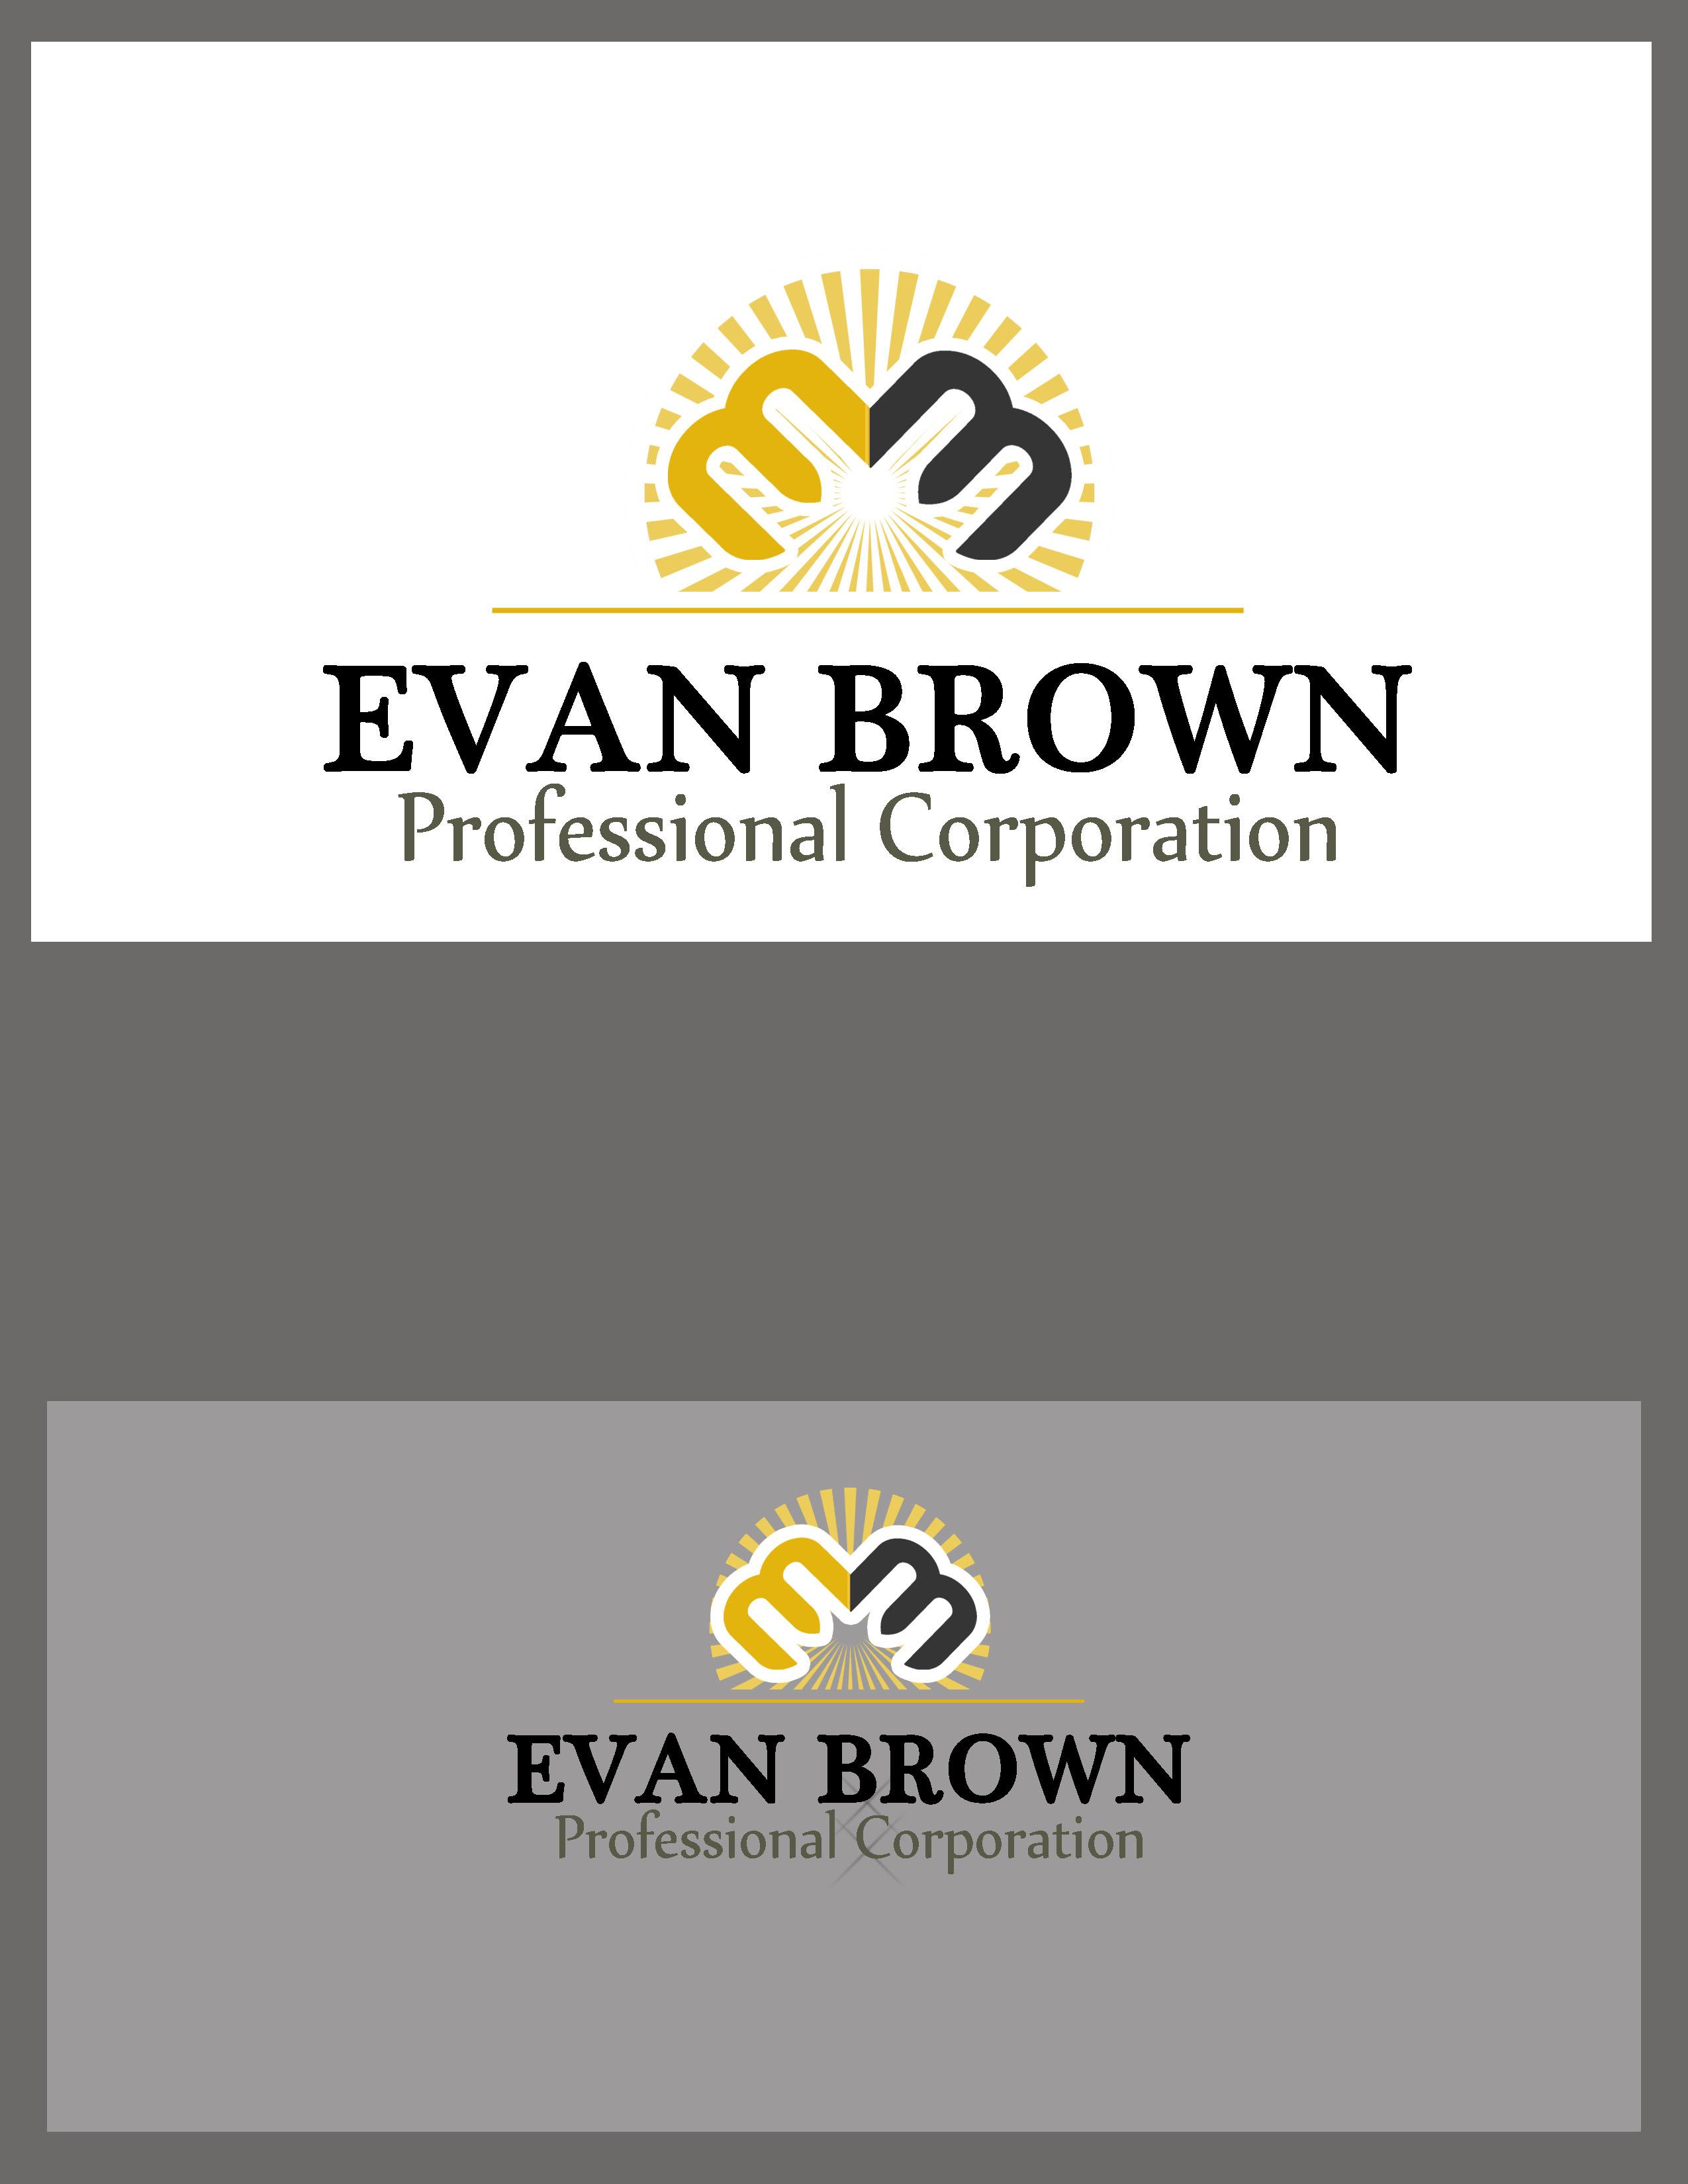 Logo Design by Allan Esclamado - Entry No. 232 in the Logo Design Contest Inspiring Logo Design for Evan Brown Professional Corporation.